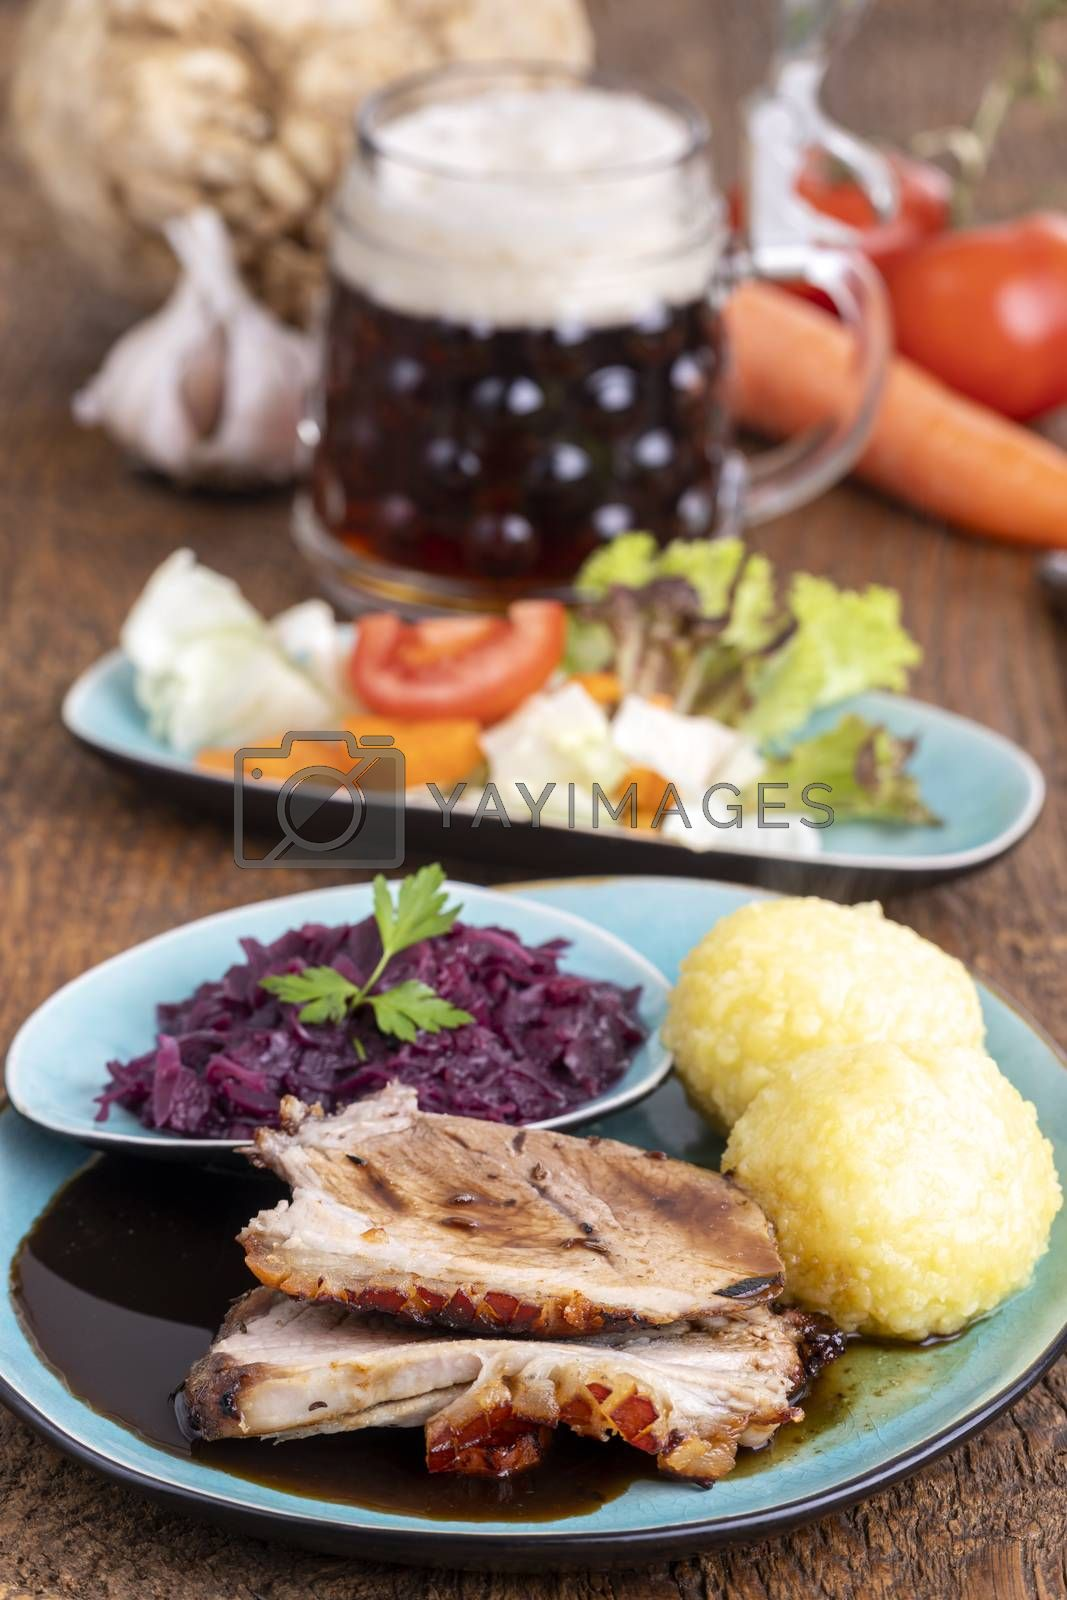 bavarian roasted pork by bernjuer